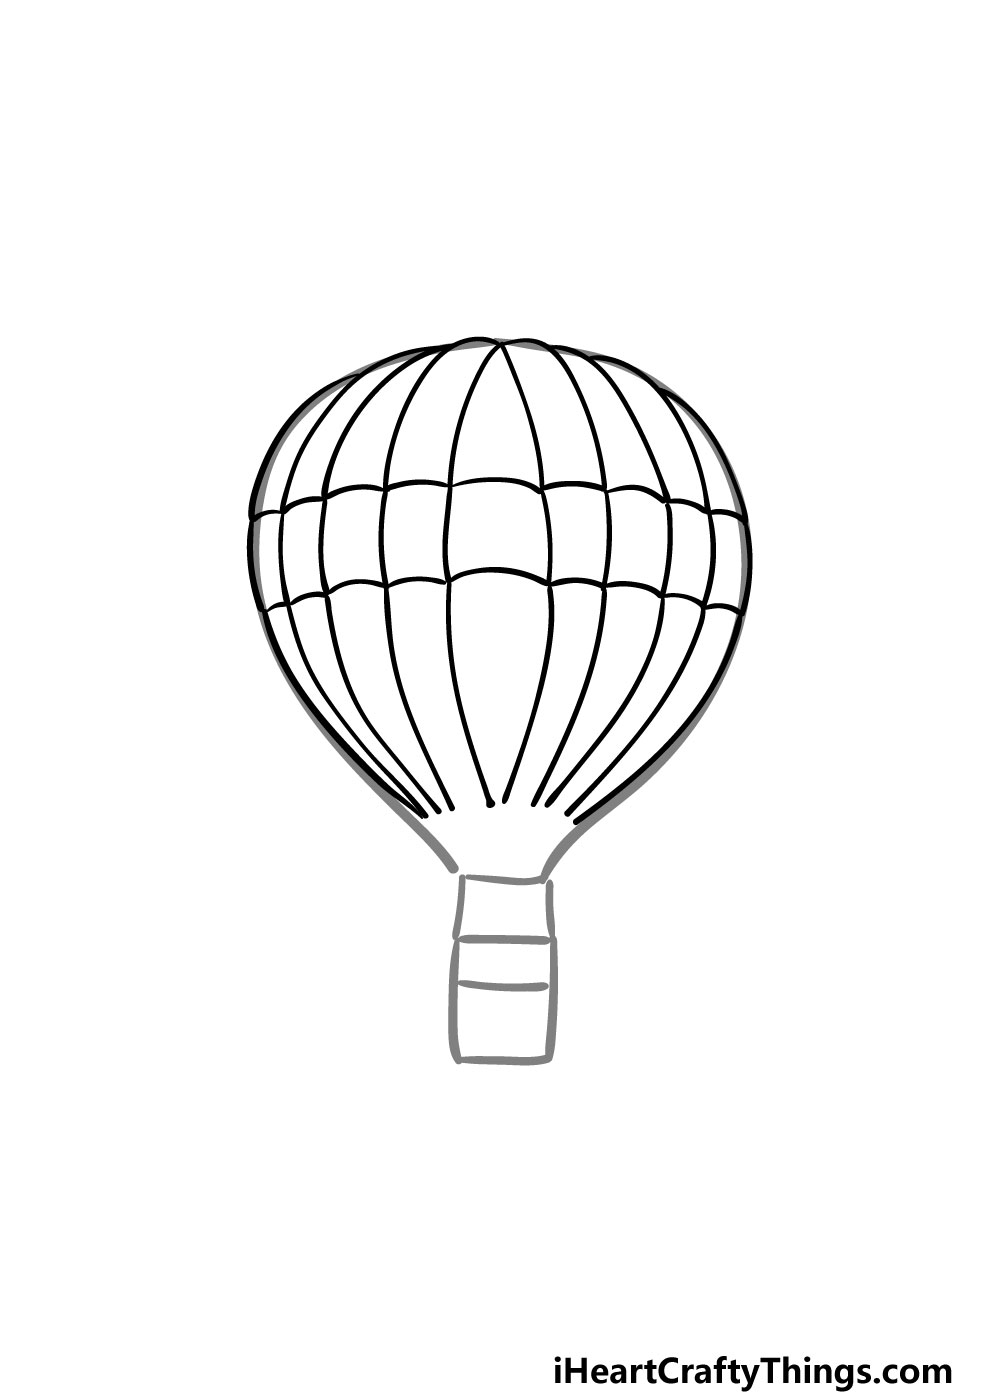 drawing a hot air balloon step 4